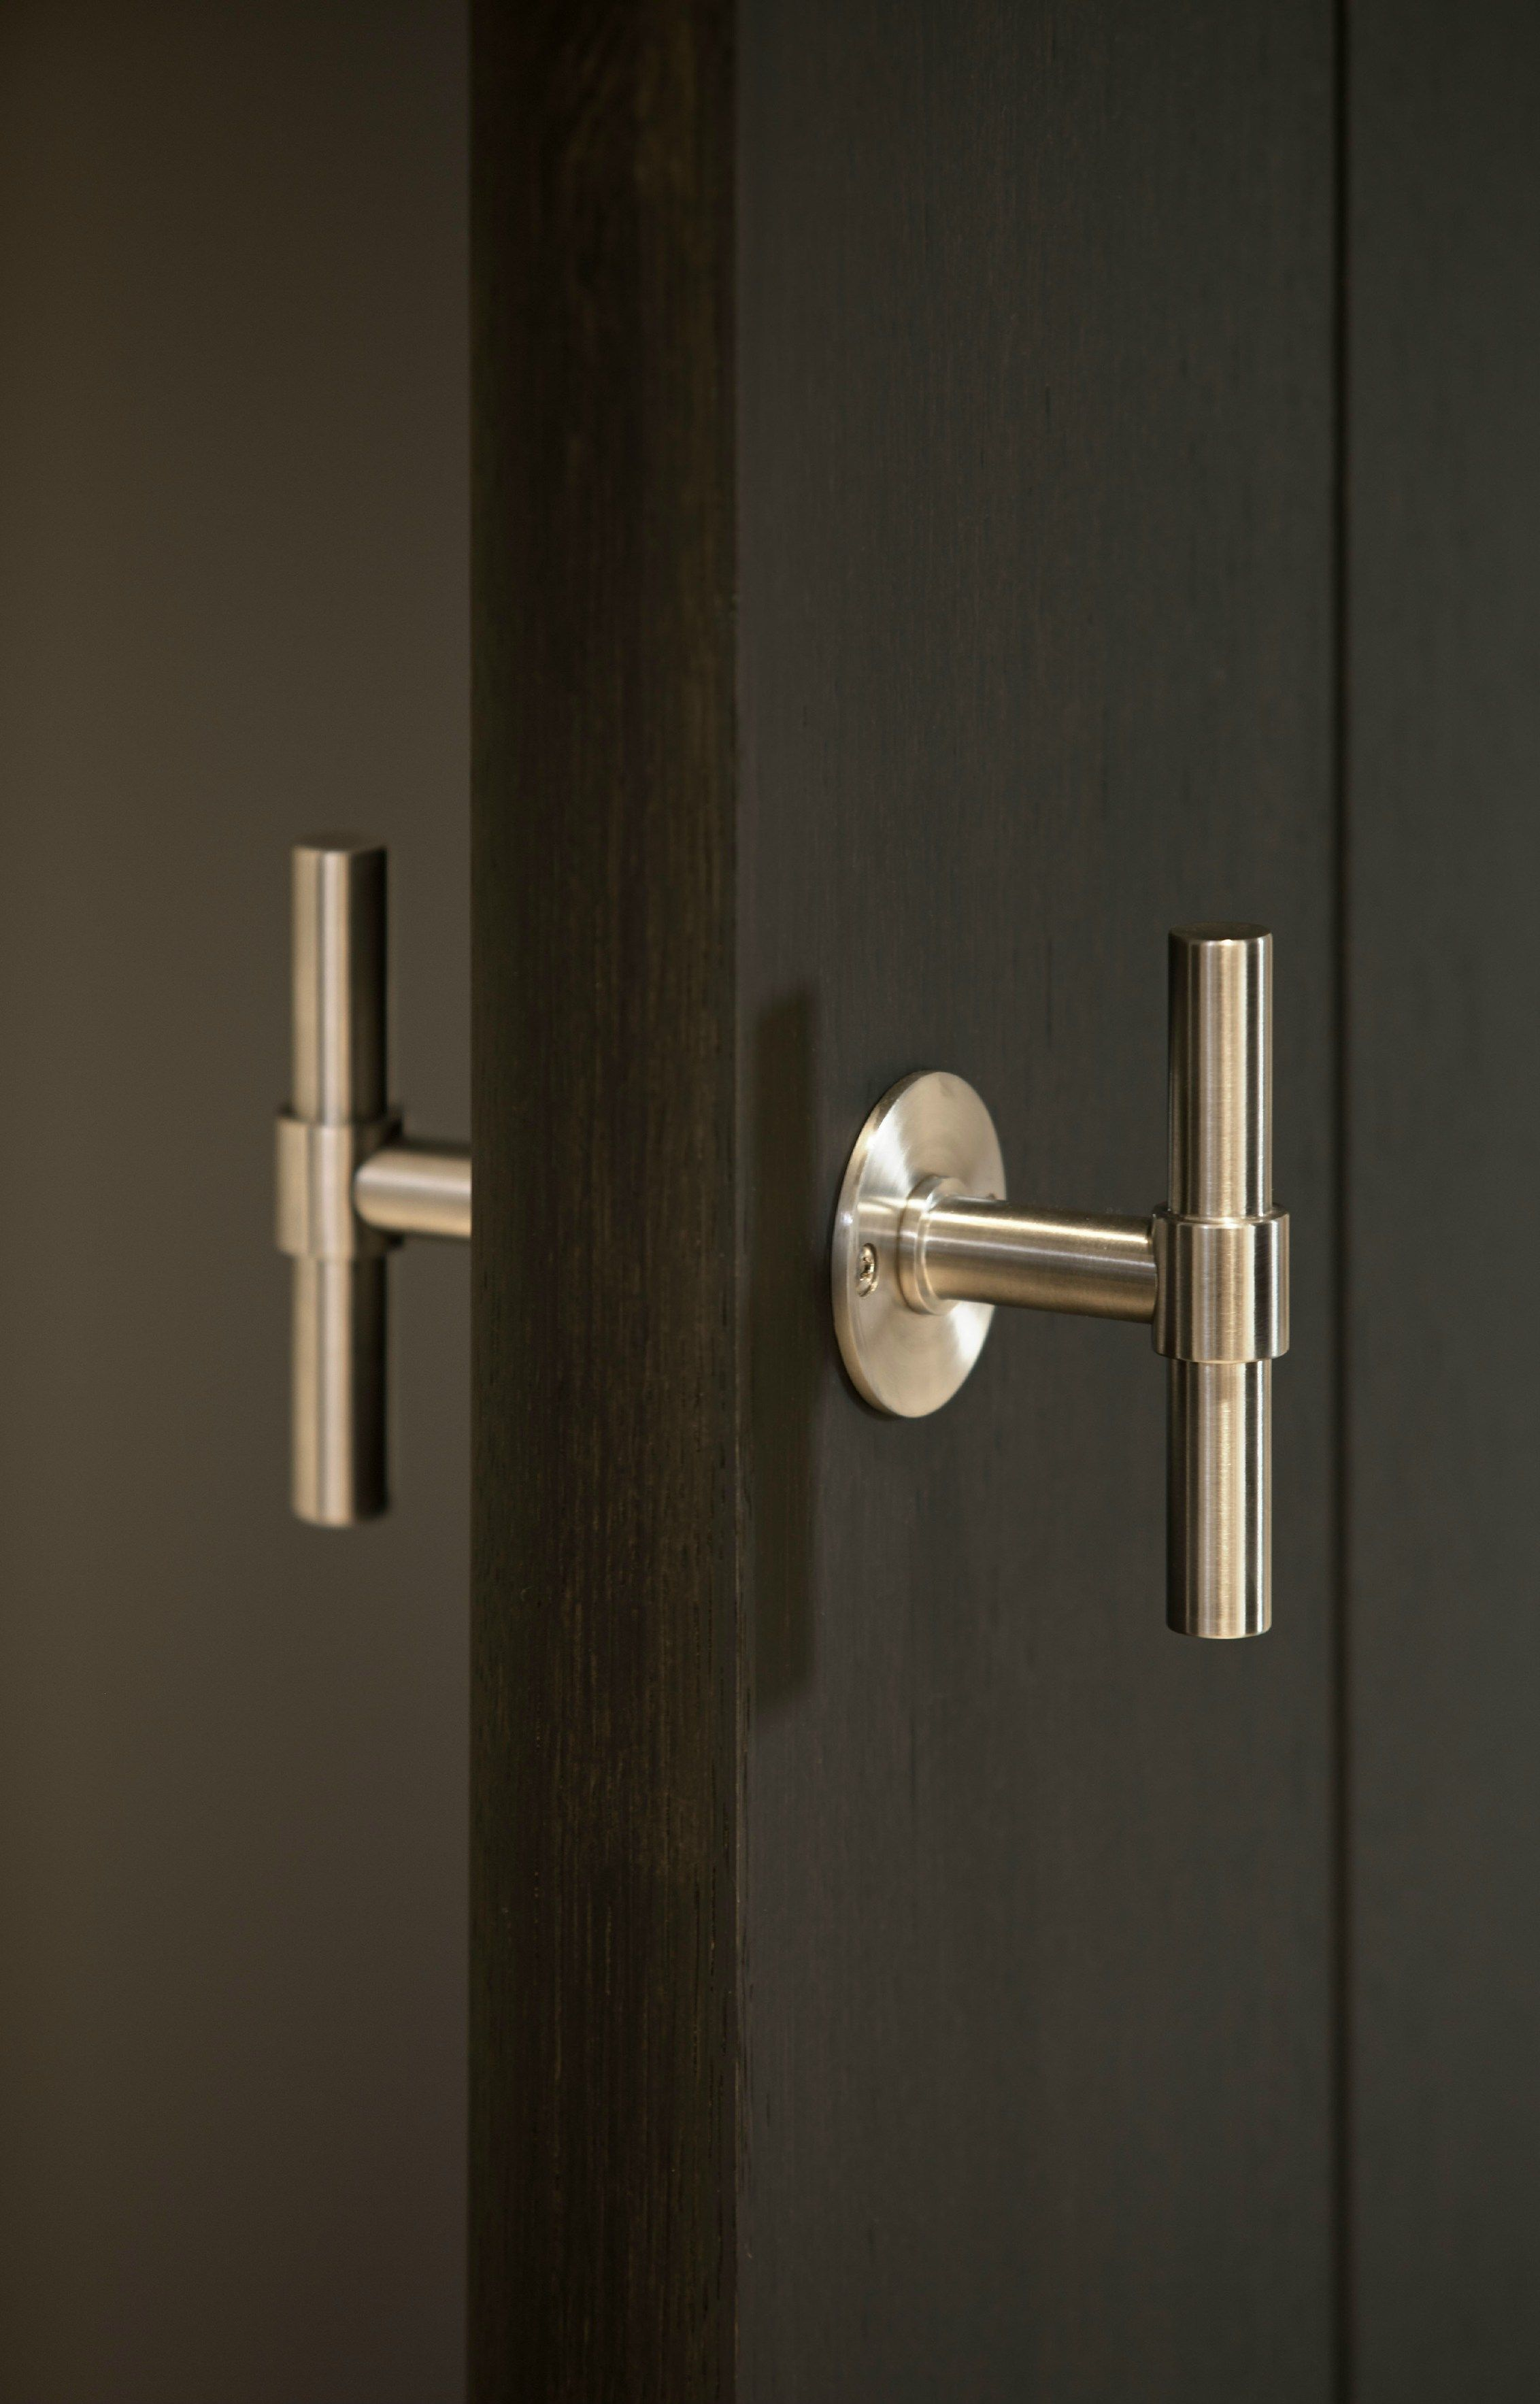 Stainless steel door knob ONE Series by FORMANI® | design Piet Boon & Stainless steel door knob ONE Series by FORMANI® | design Piet ... Pezcame.Com